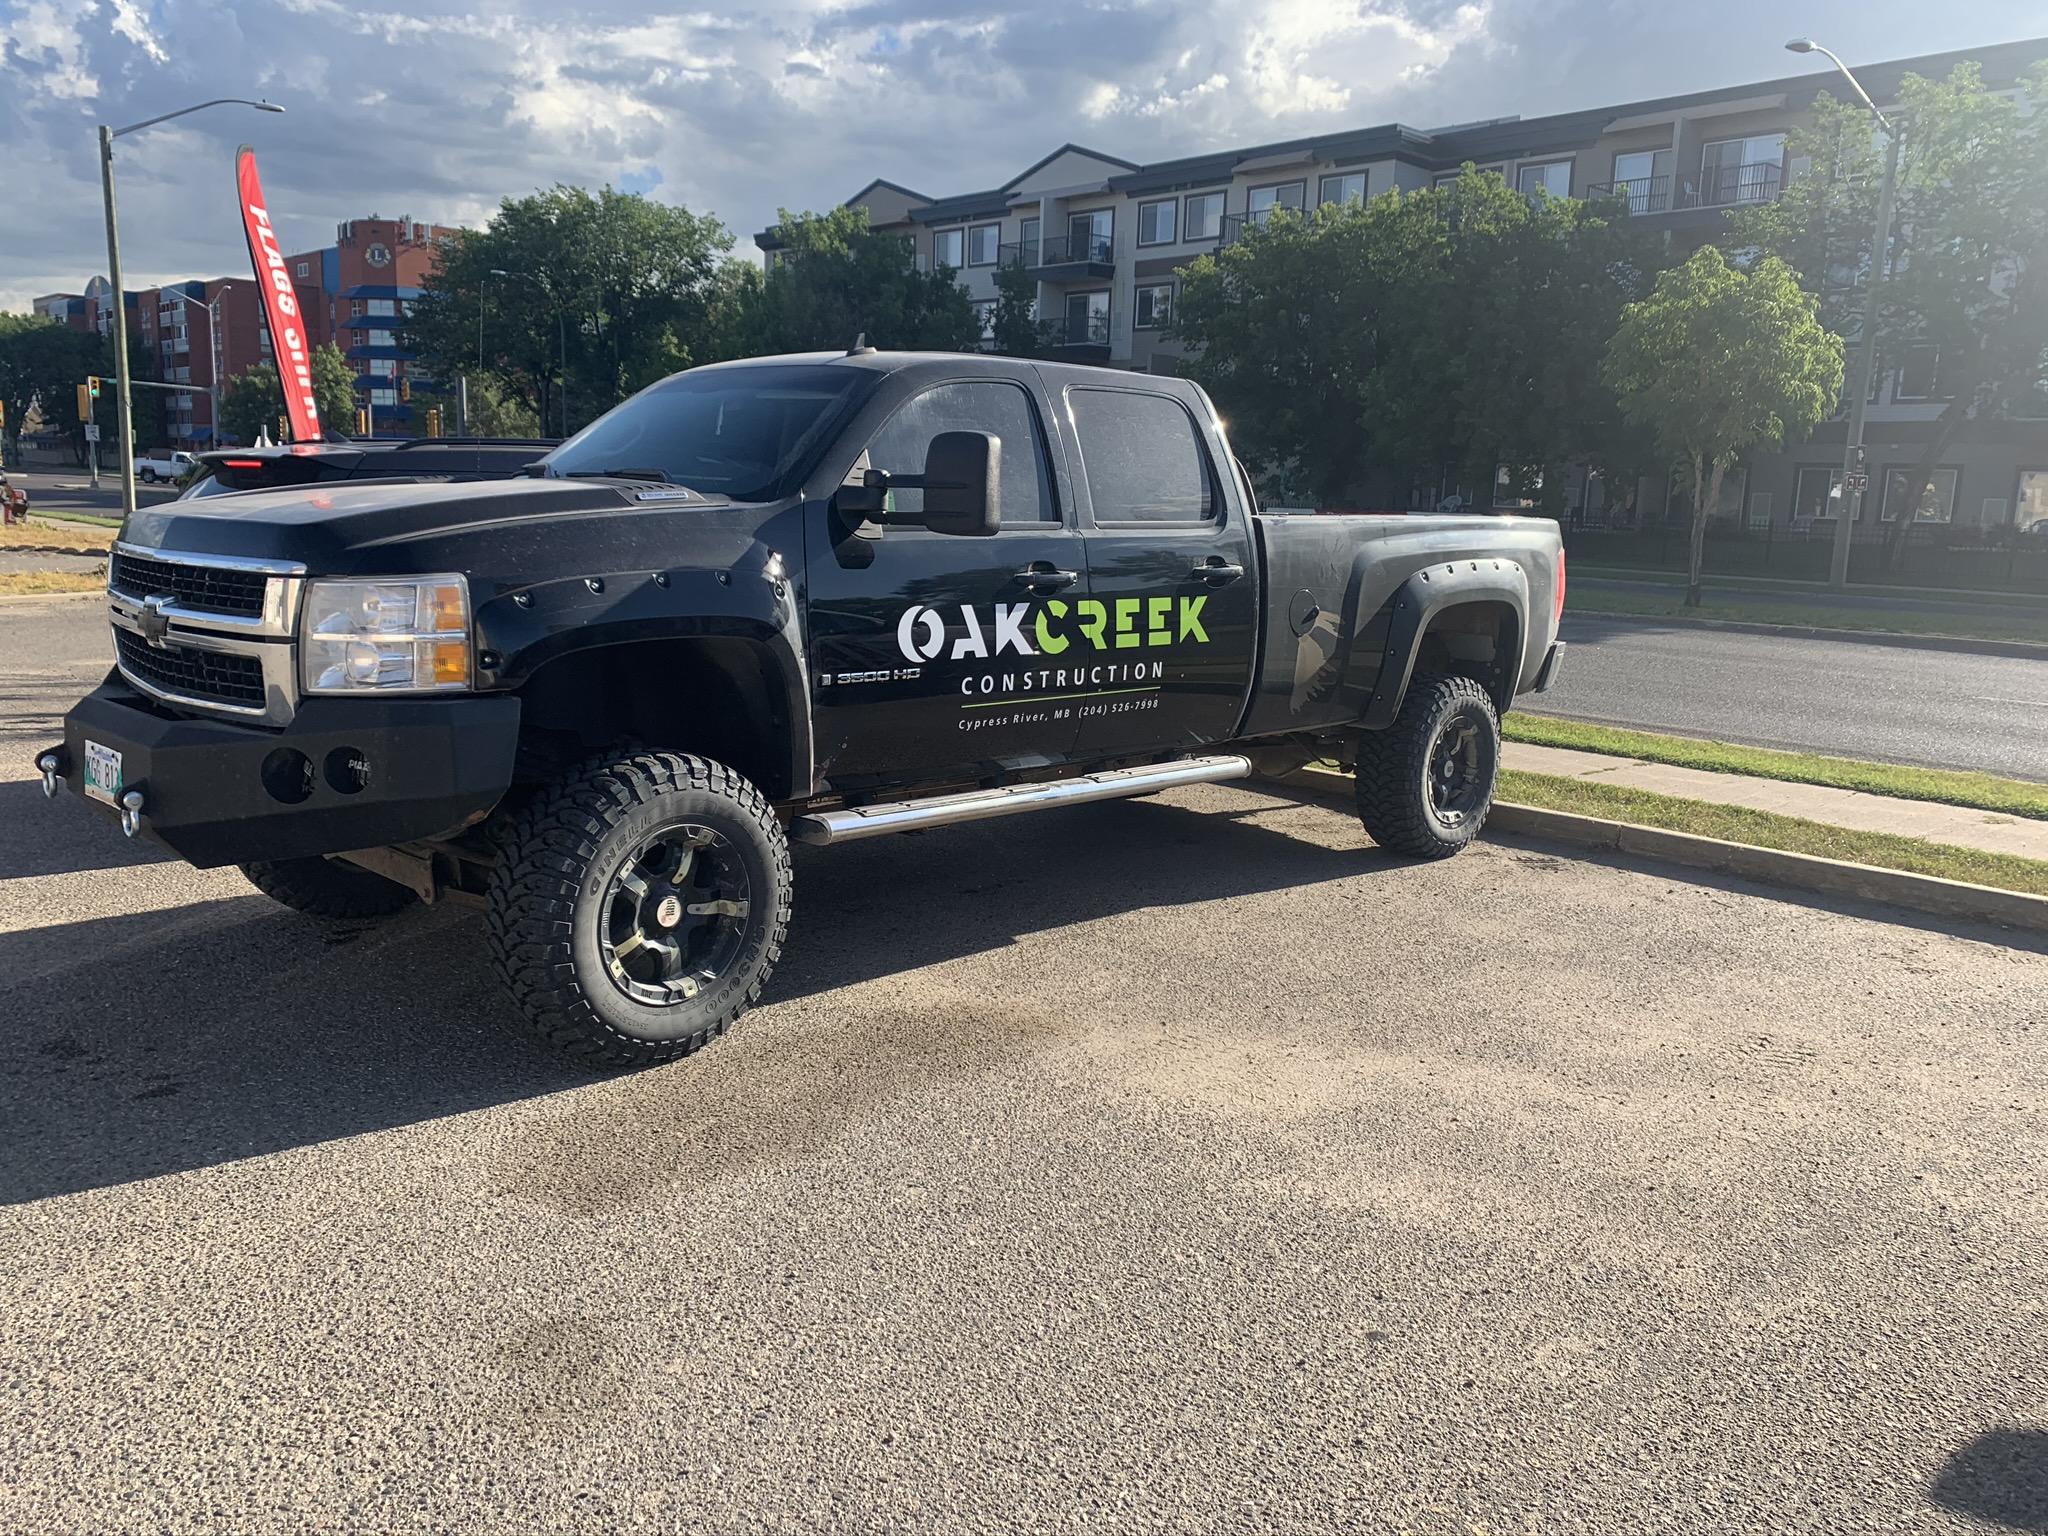 Oak Creek Construction